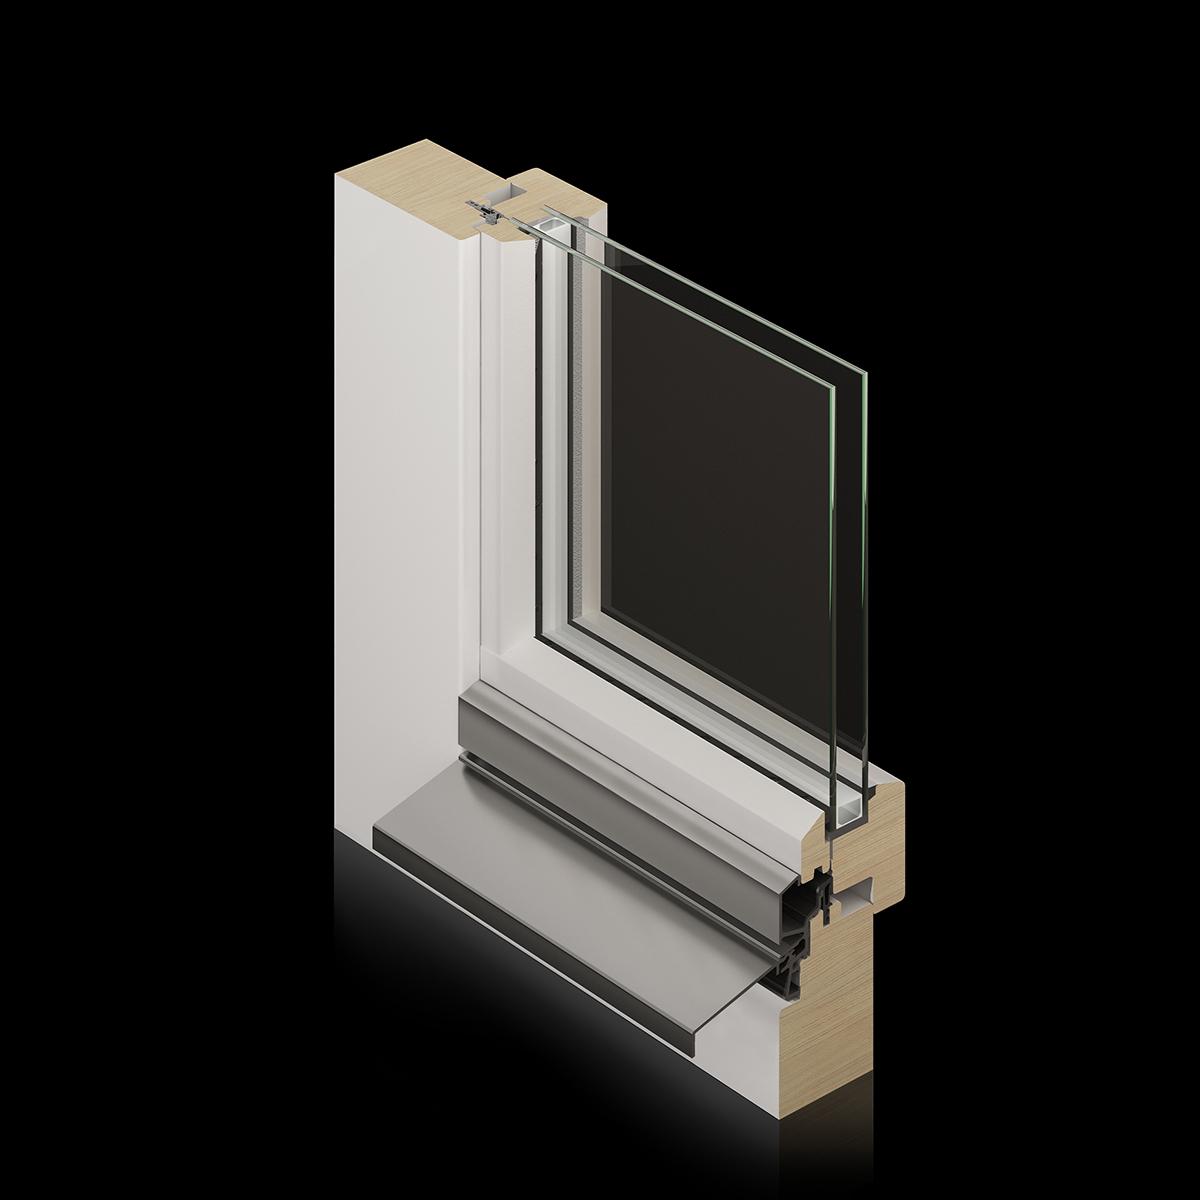 Bünter Fenster